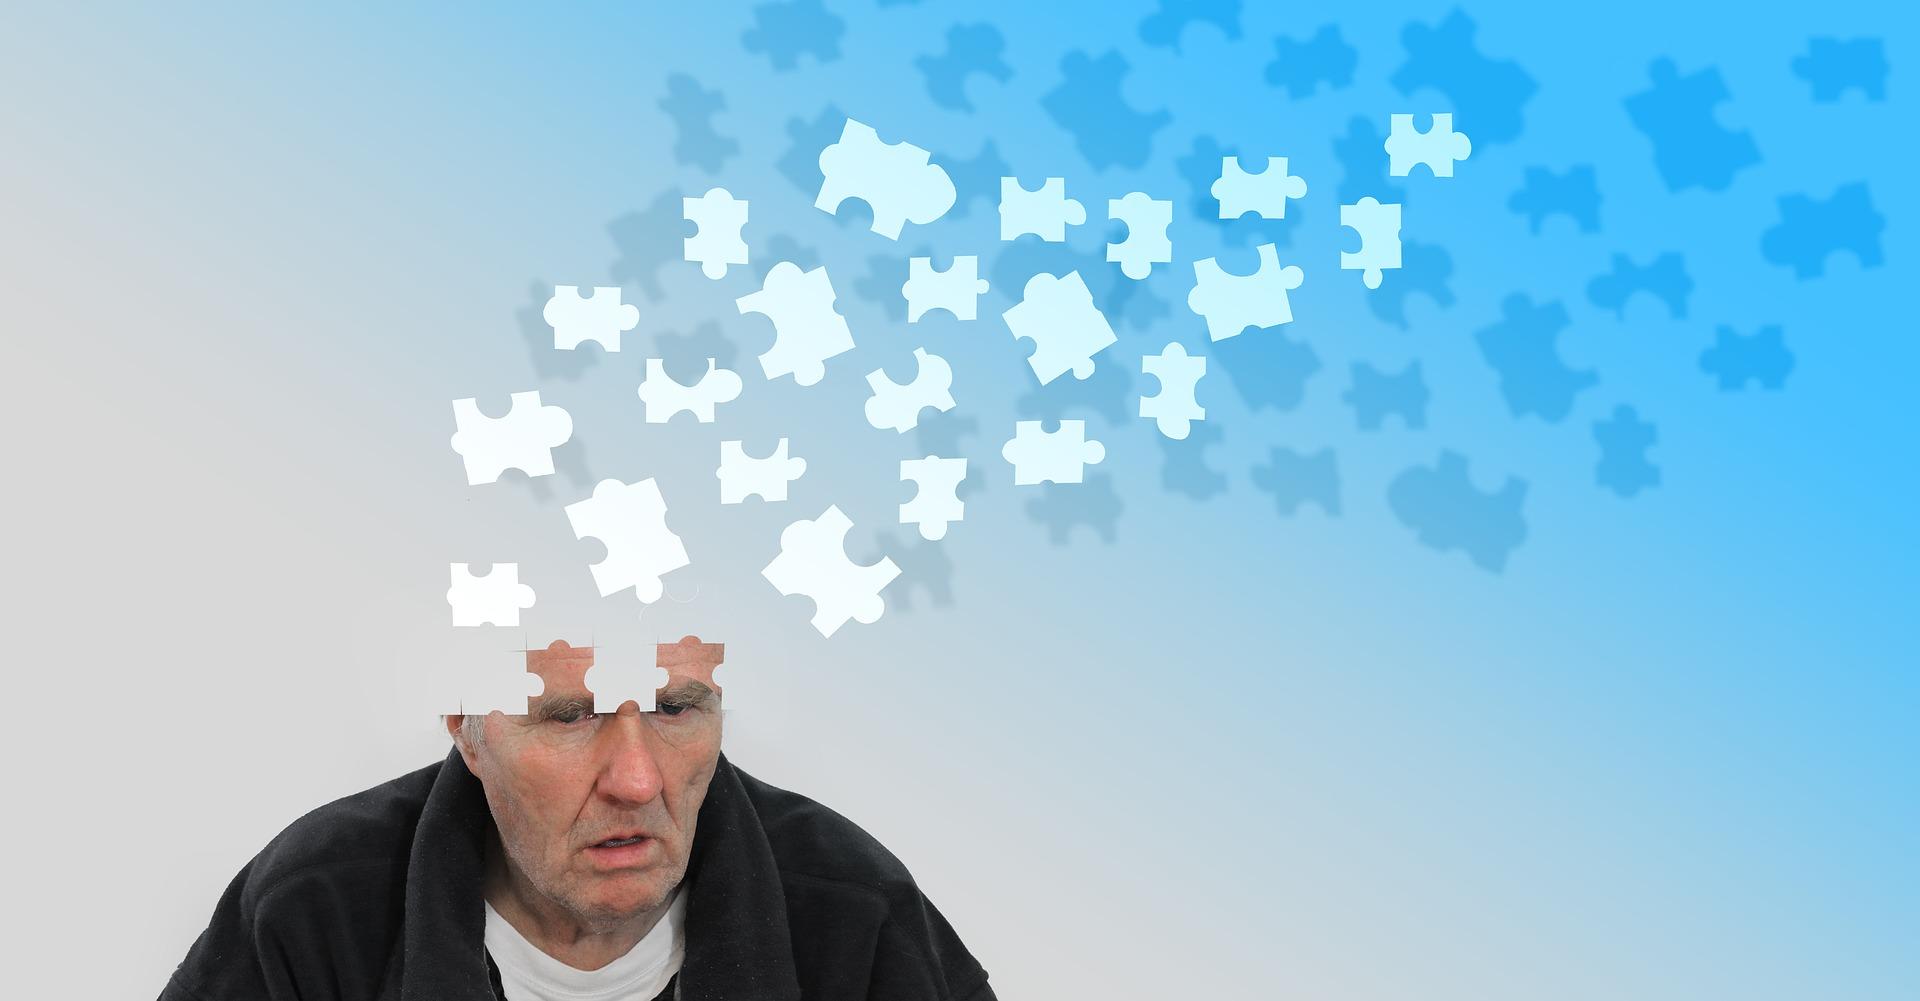 dementia-3051832_1920.jpg